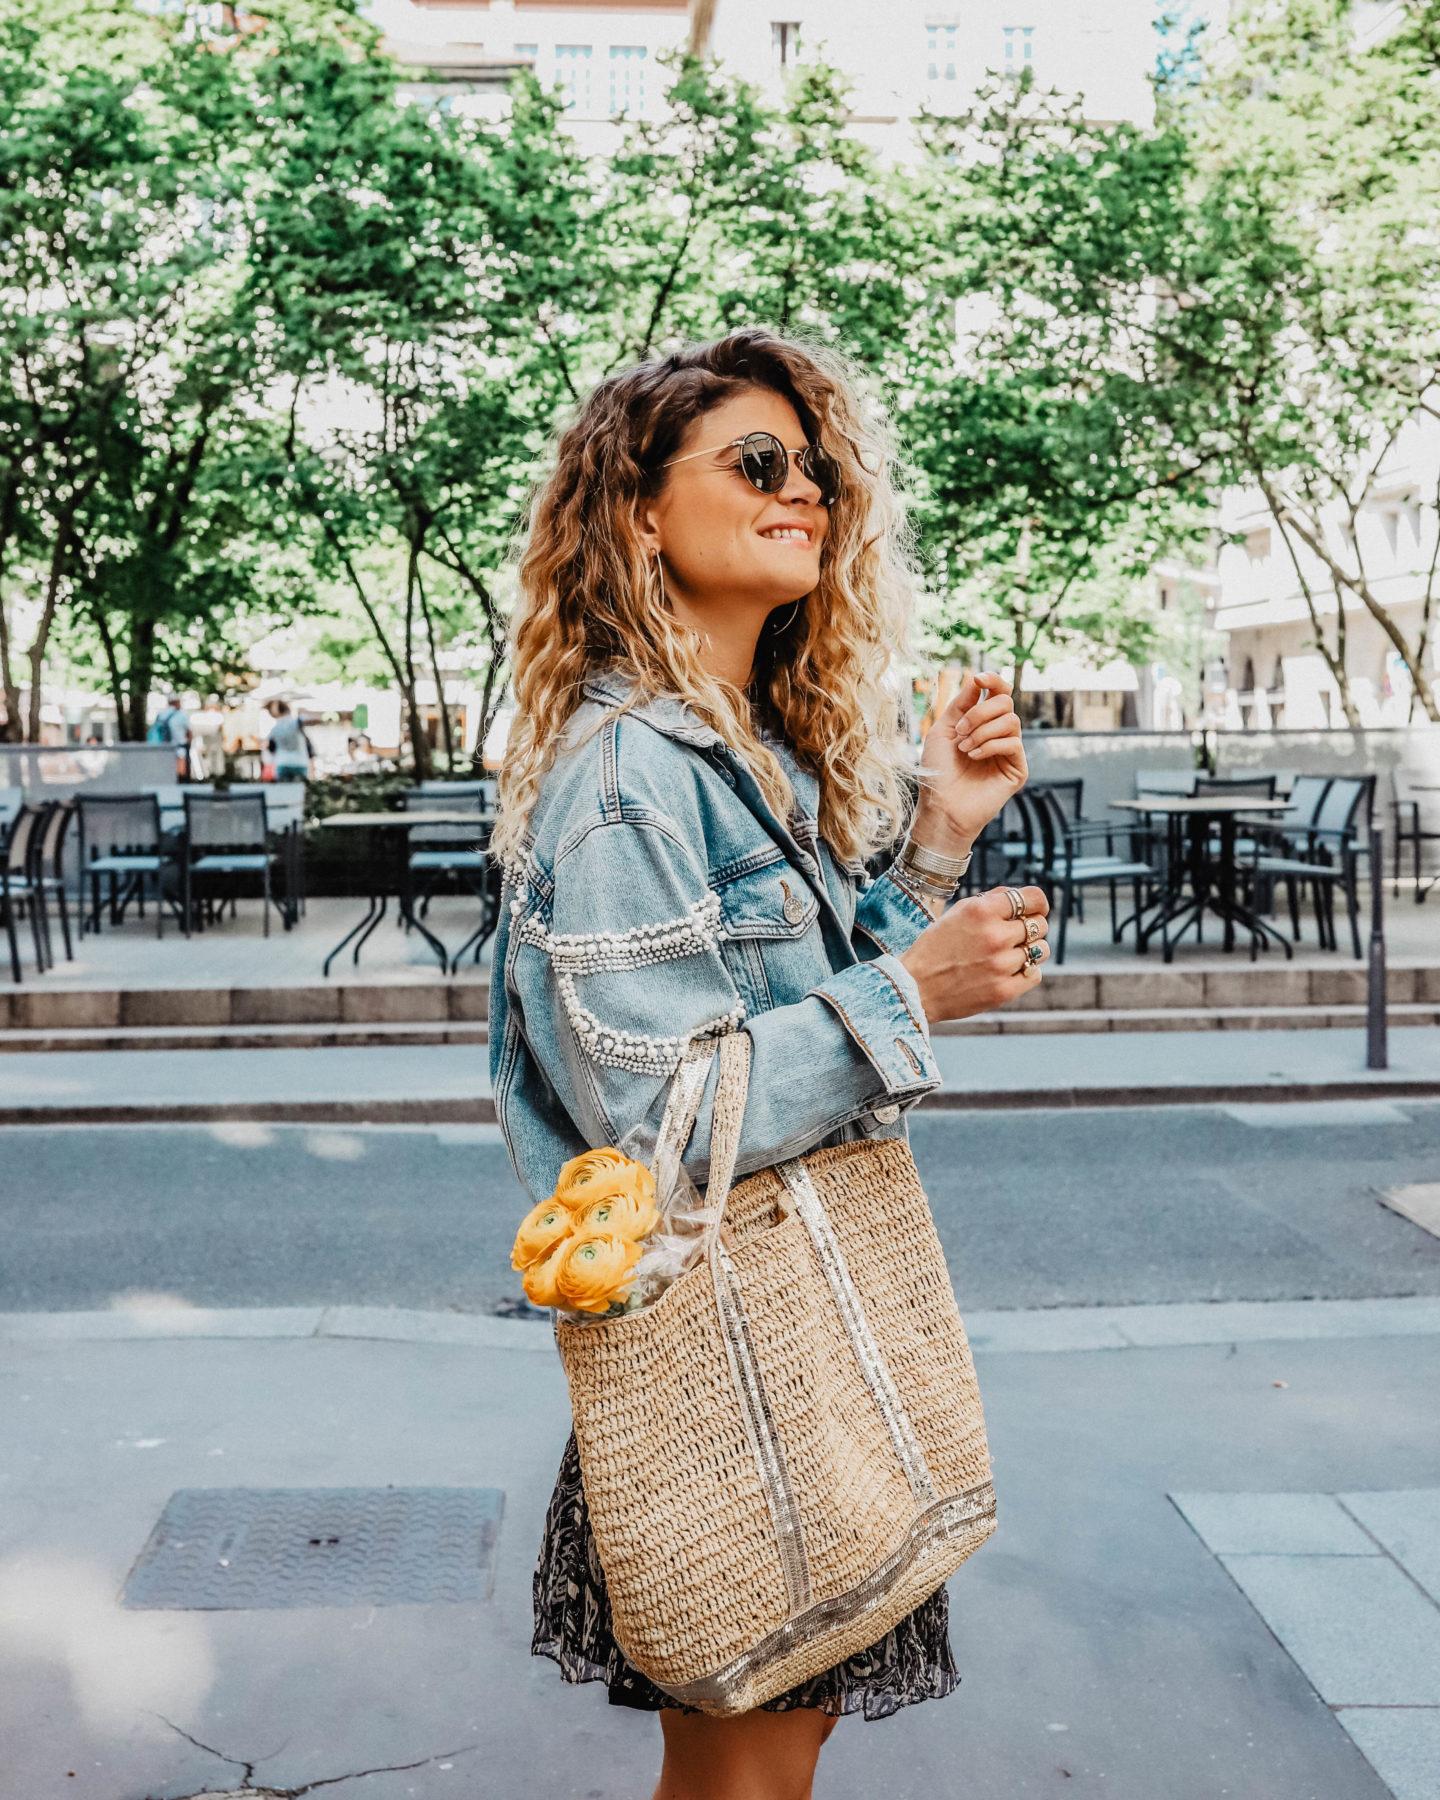 sac Vanessa Bruno en rafiat marie and mood blog mode